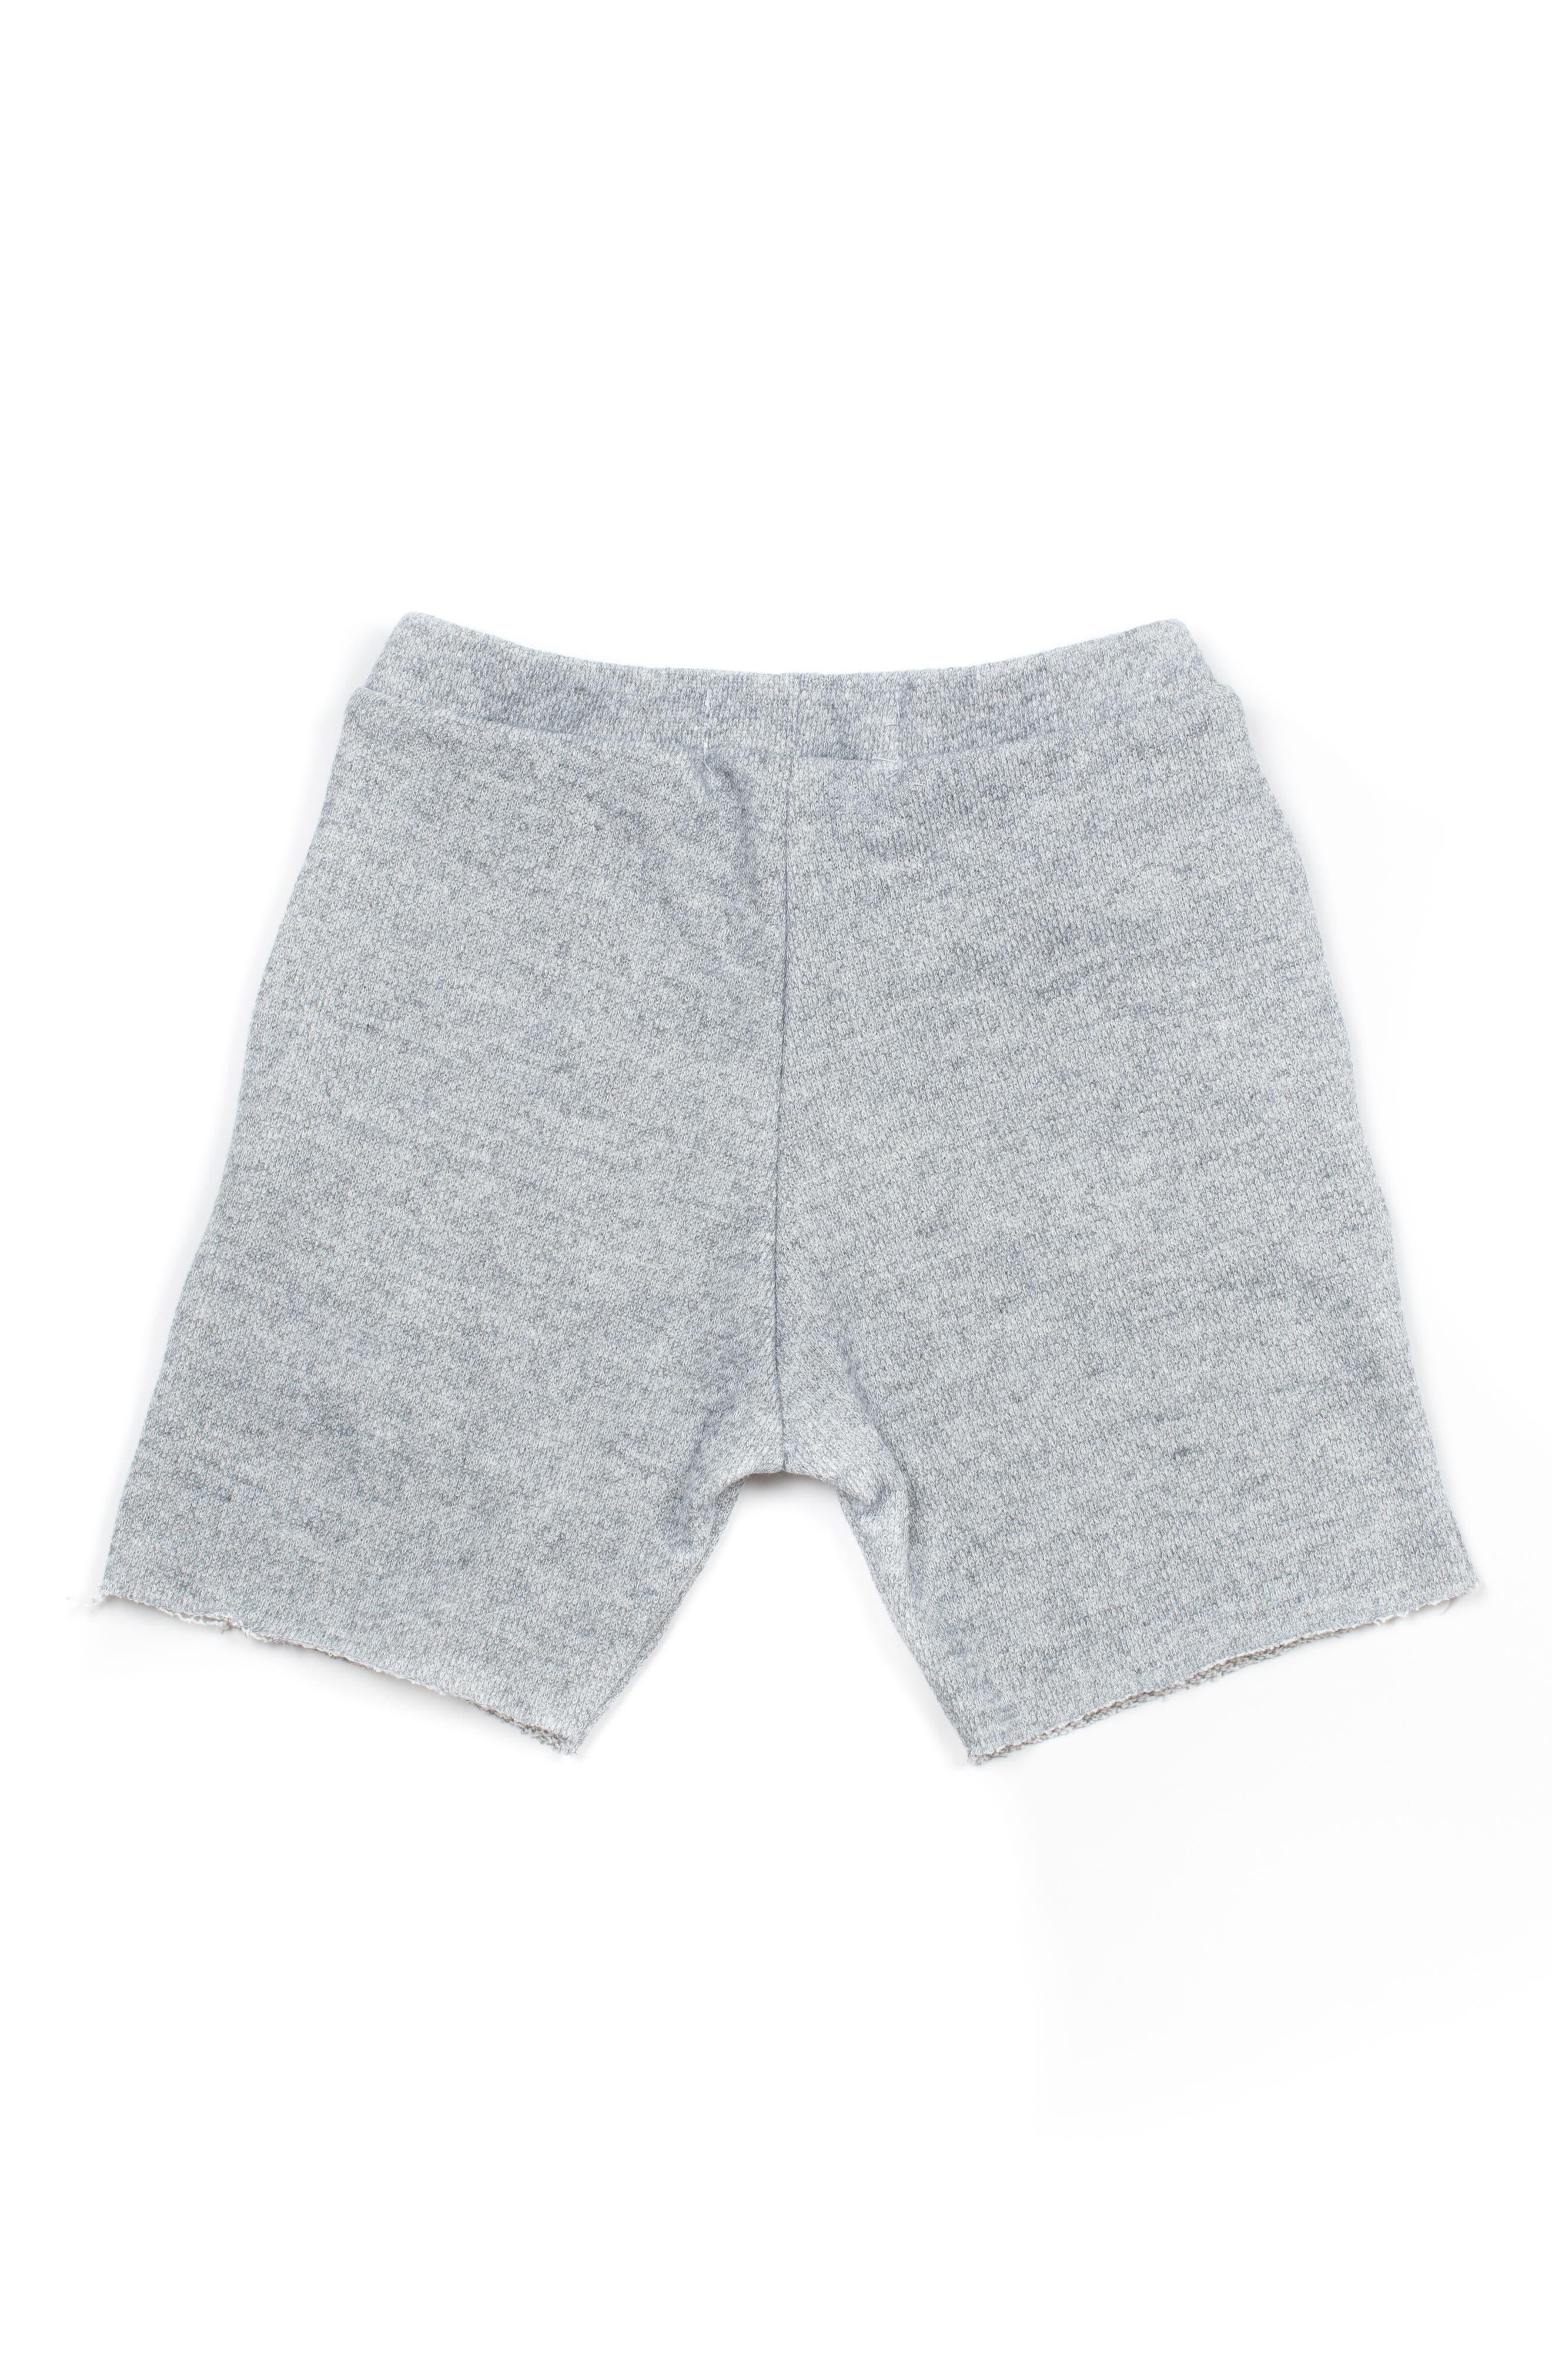 Chance Shorts,                             Alternate thumbnail 2, color,                             Grey